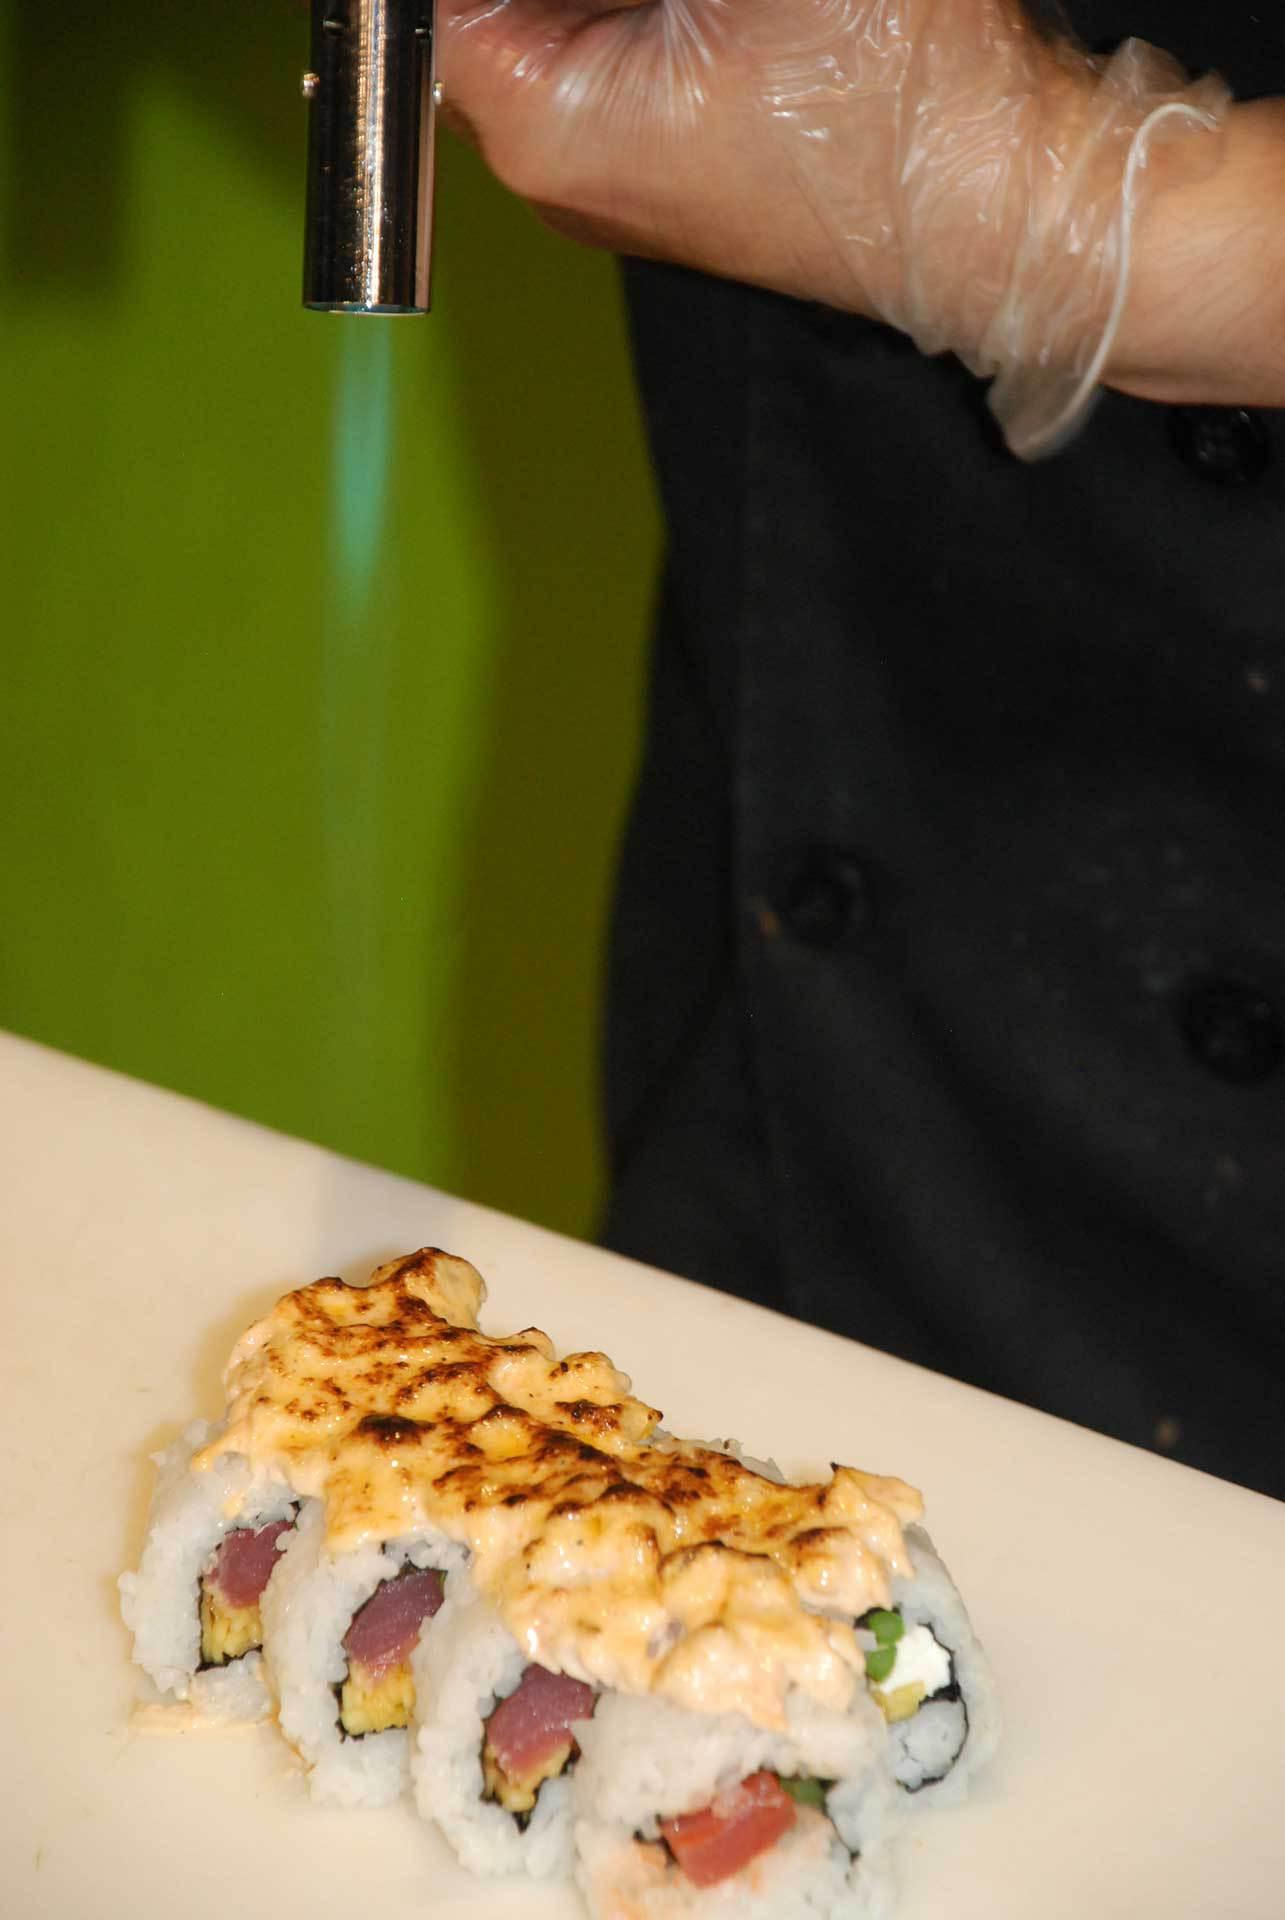 The Best Sushi Restaurant Orlando FL